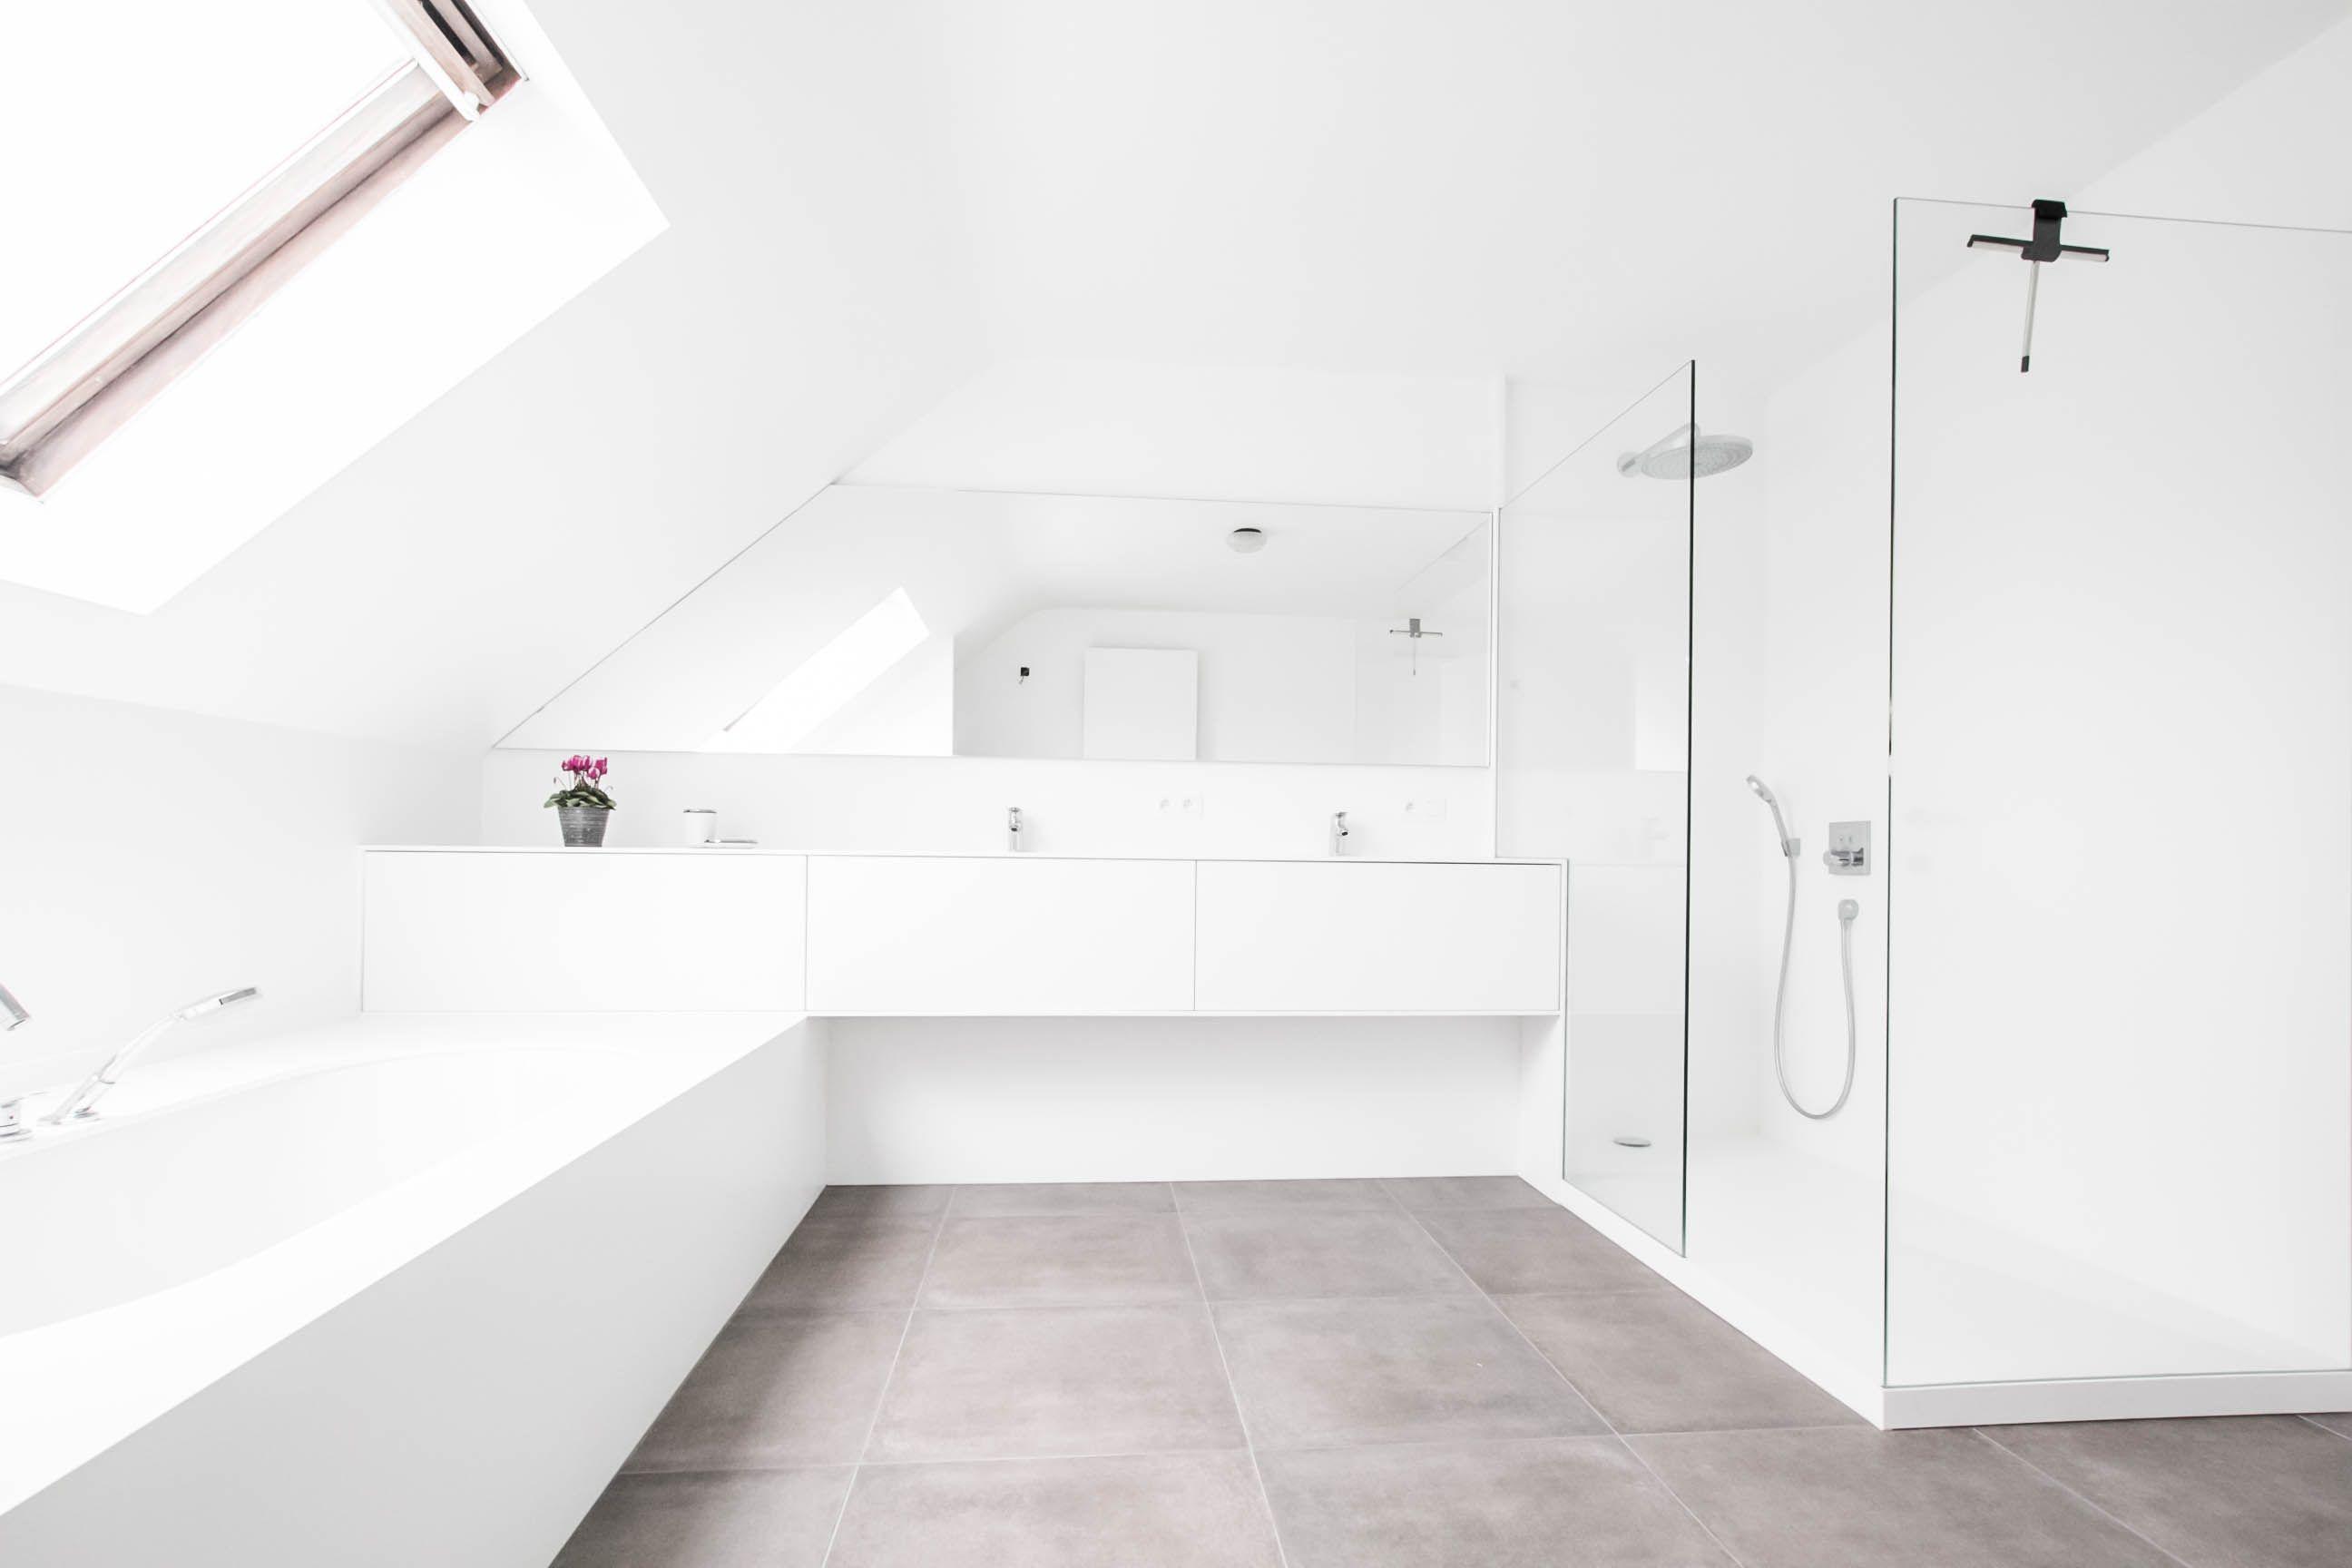 Inloopdouche Met Badkamerkastje : Badkamerinspiratie moderne badkamer met ligbad inloopdouche en